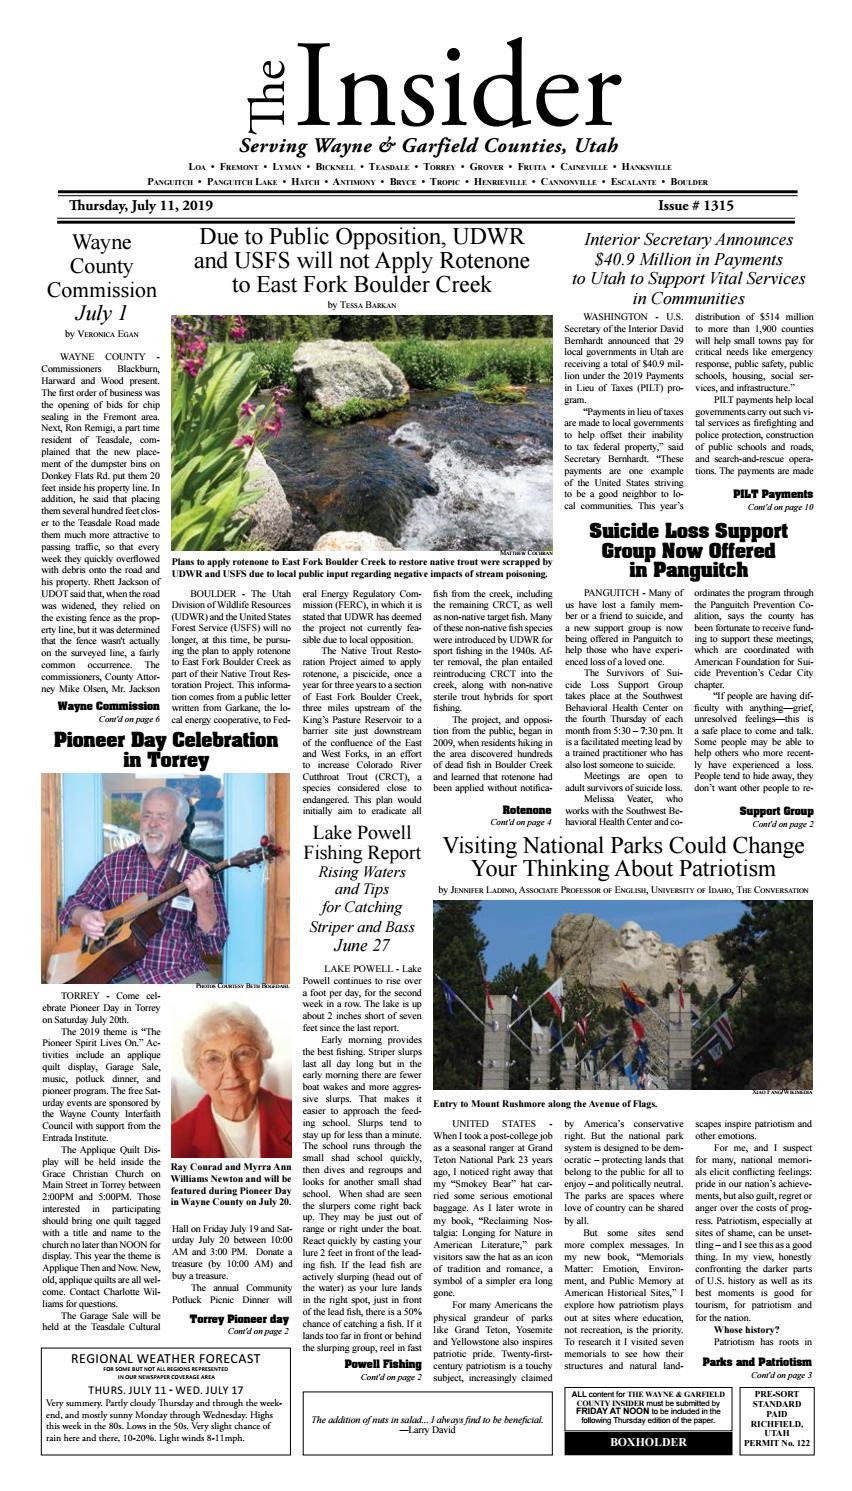 The Wayne & Garfield County Insider July 11, 2019 by